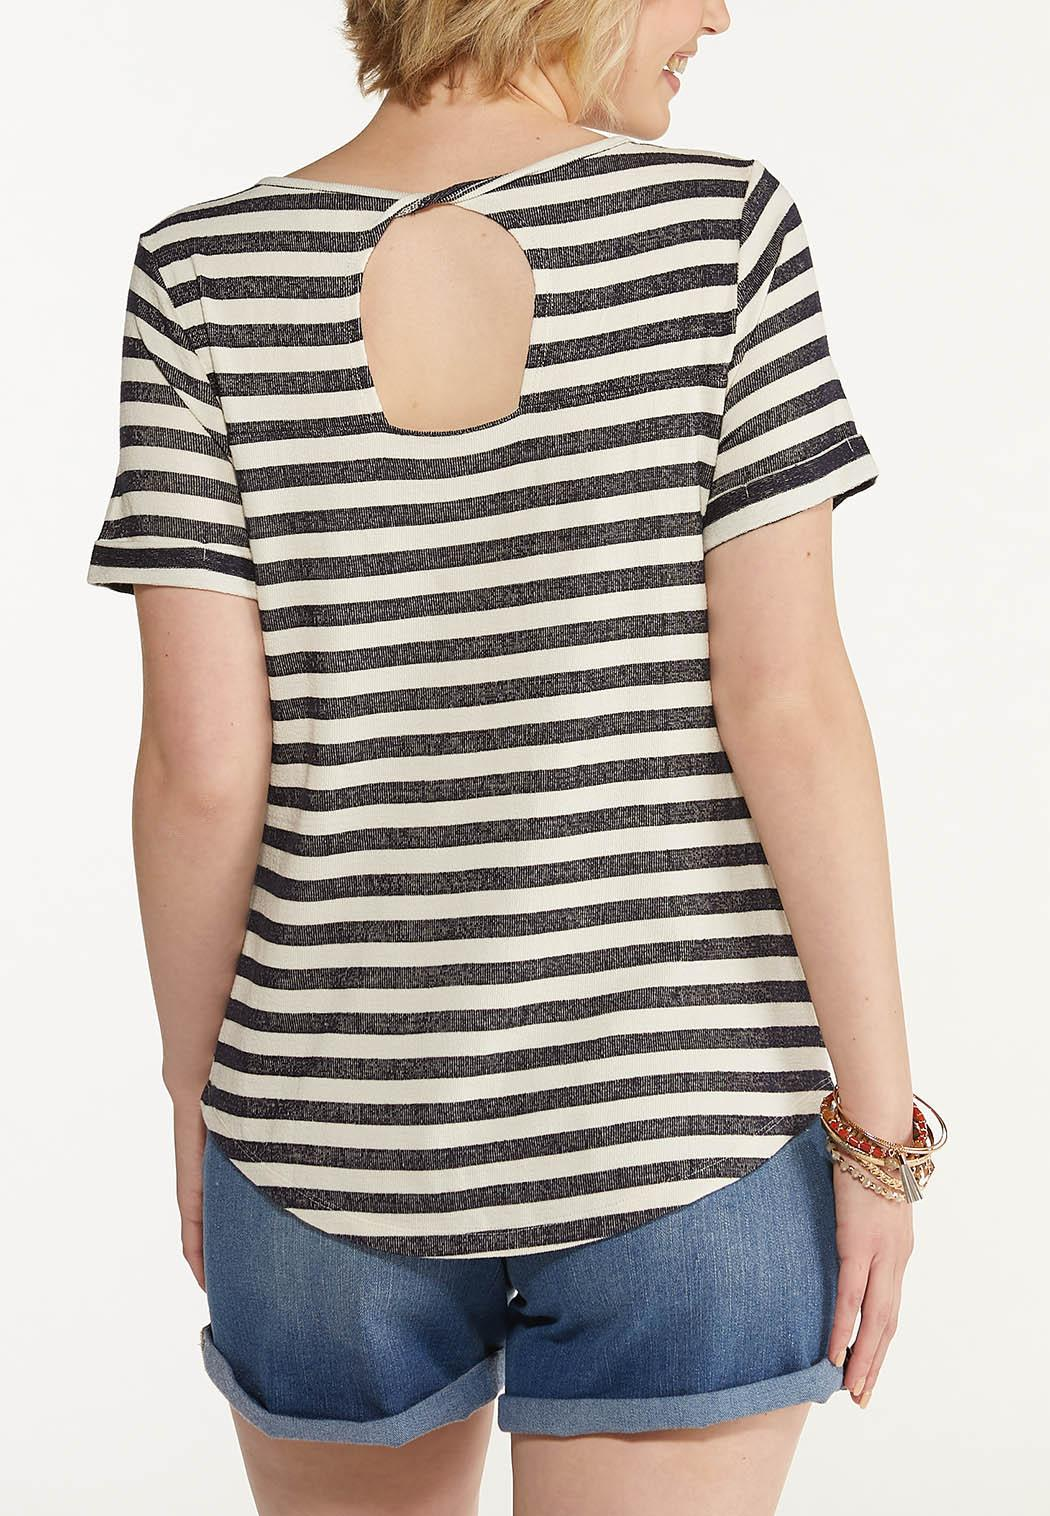 Navy Stripe Top (Item #44616001)